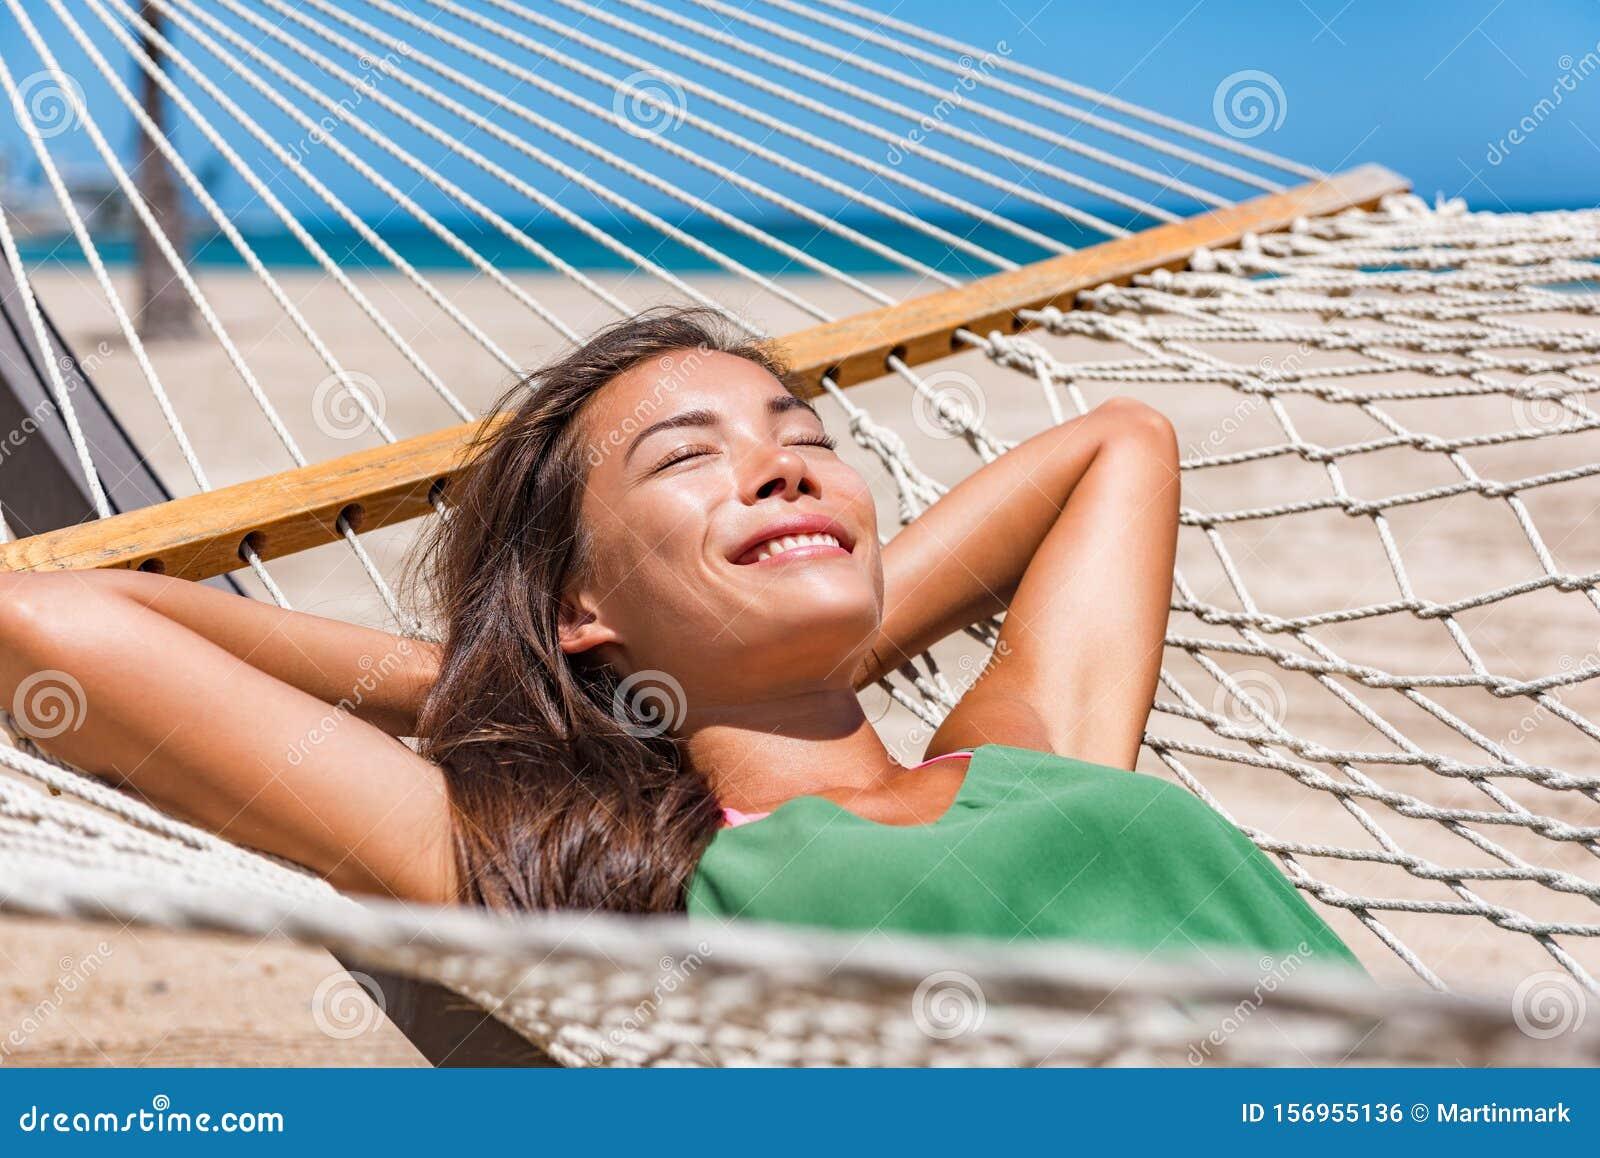 Relaxing woman sleeping on hammock in the tropical sun. Asian girl resting lying down in resort lounger laid back enjoying suntan